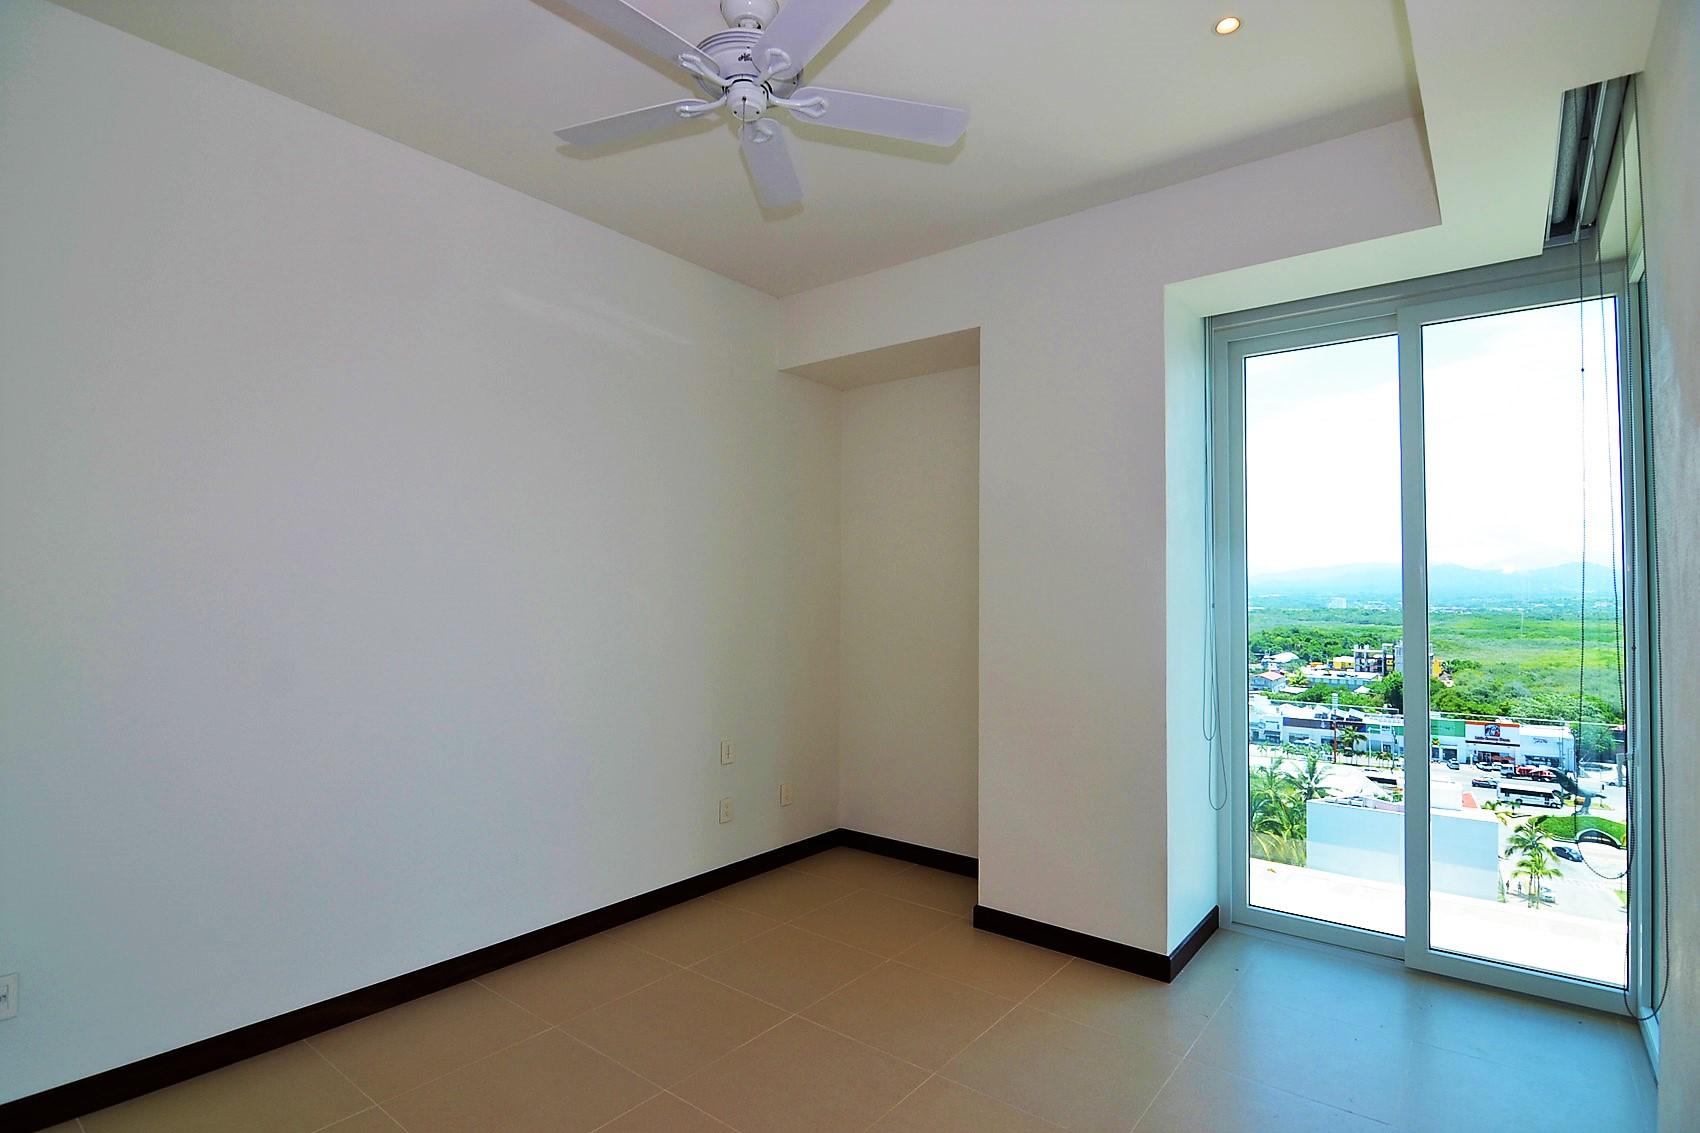 Condo VMarina PH10 - Puerto Vallarta Luxury Condo For Rent (18)